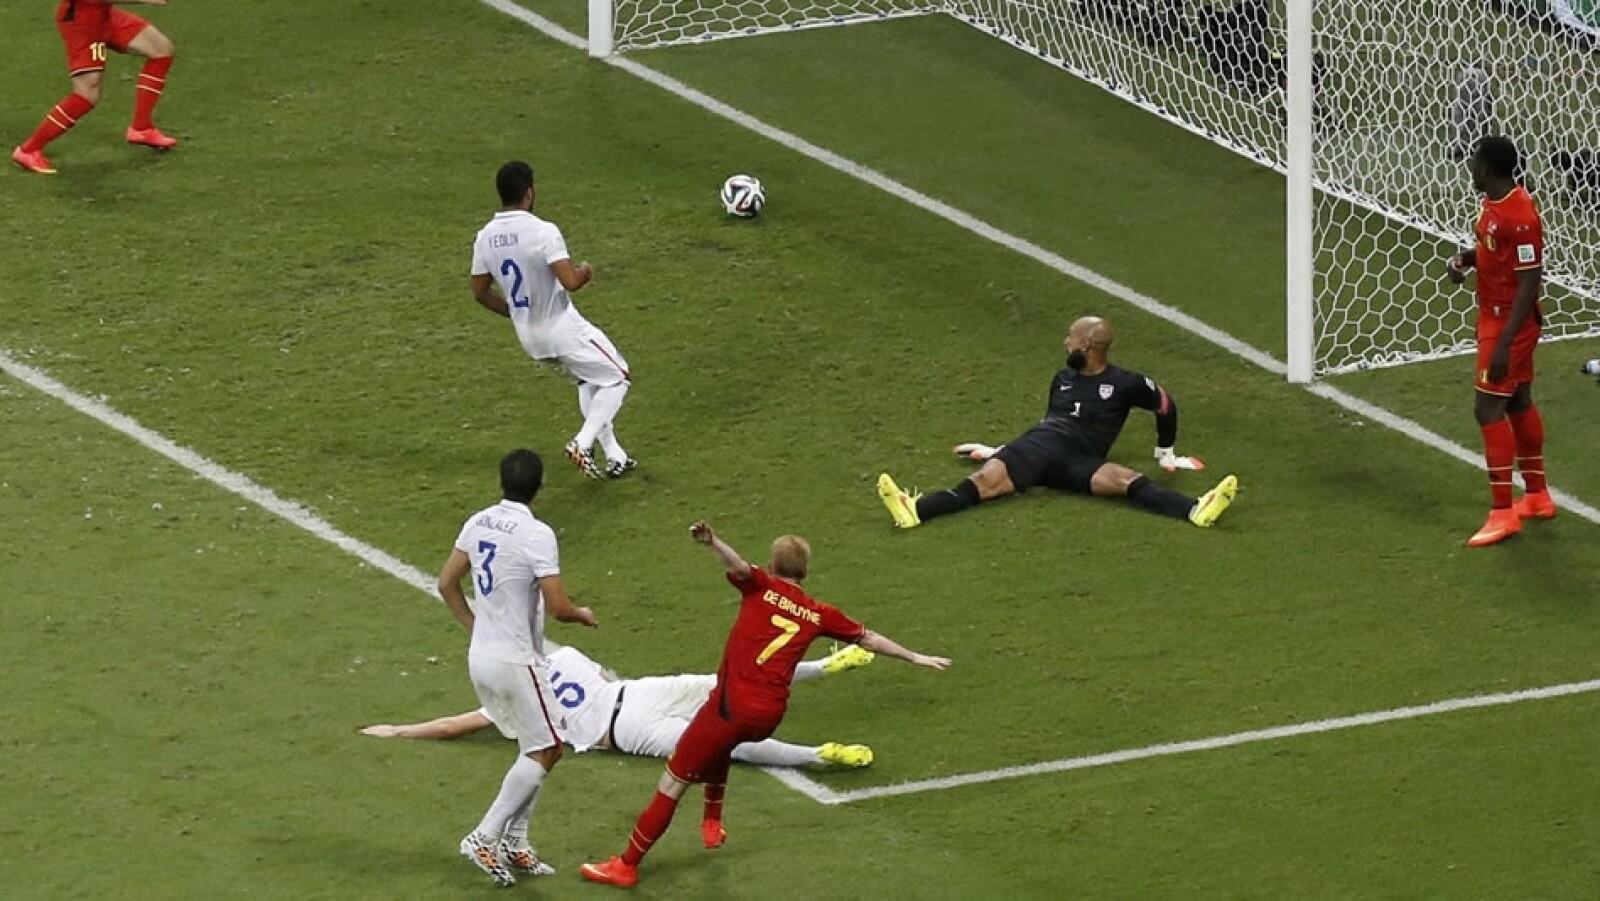 primer gol, Bélgica